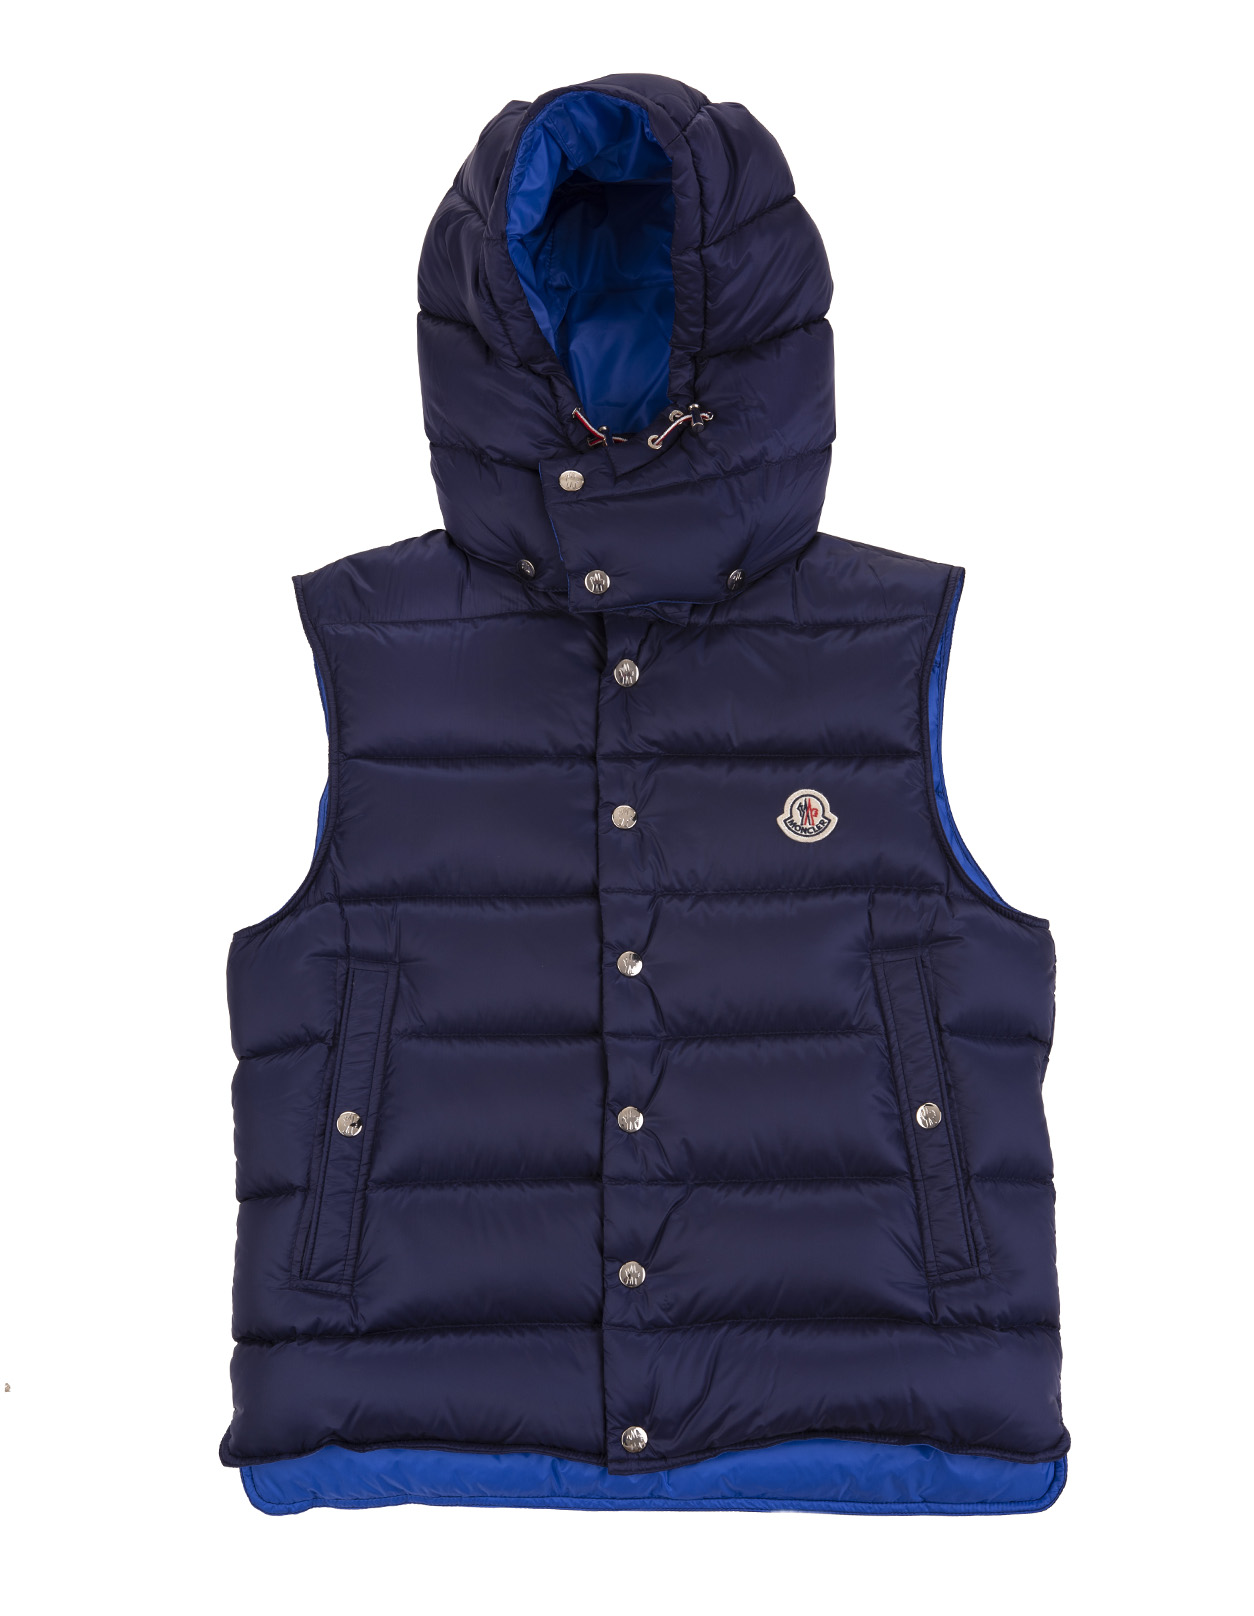 info for 05853 beca0 Blue Billecart Vest